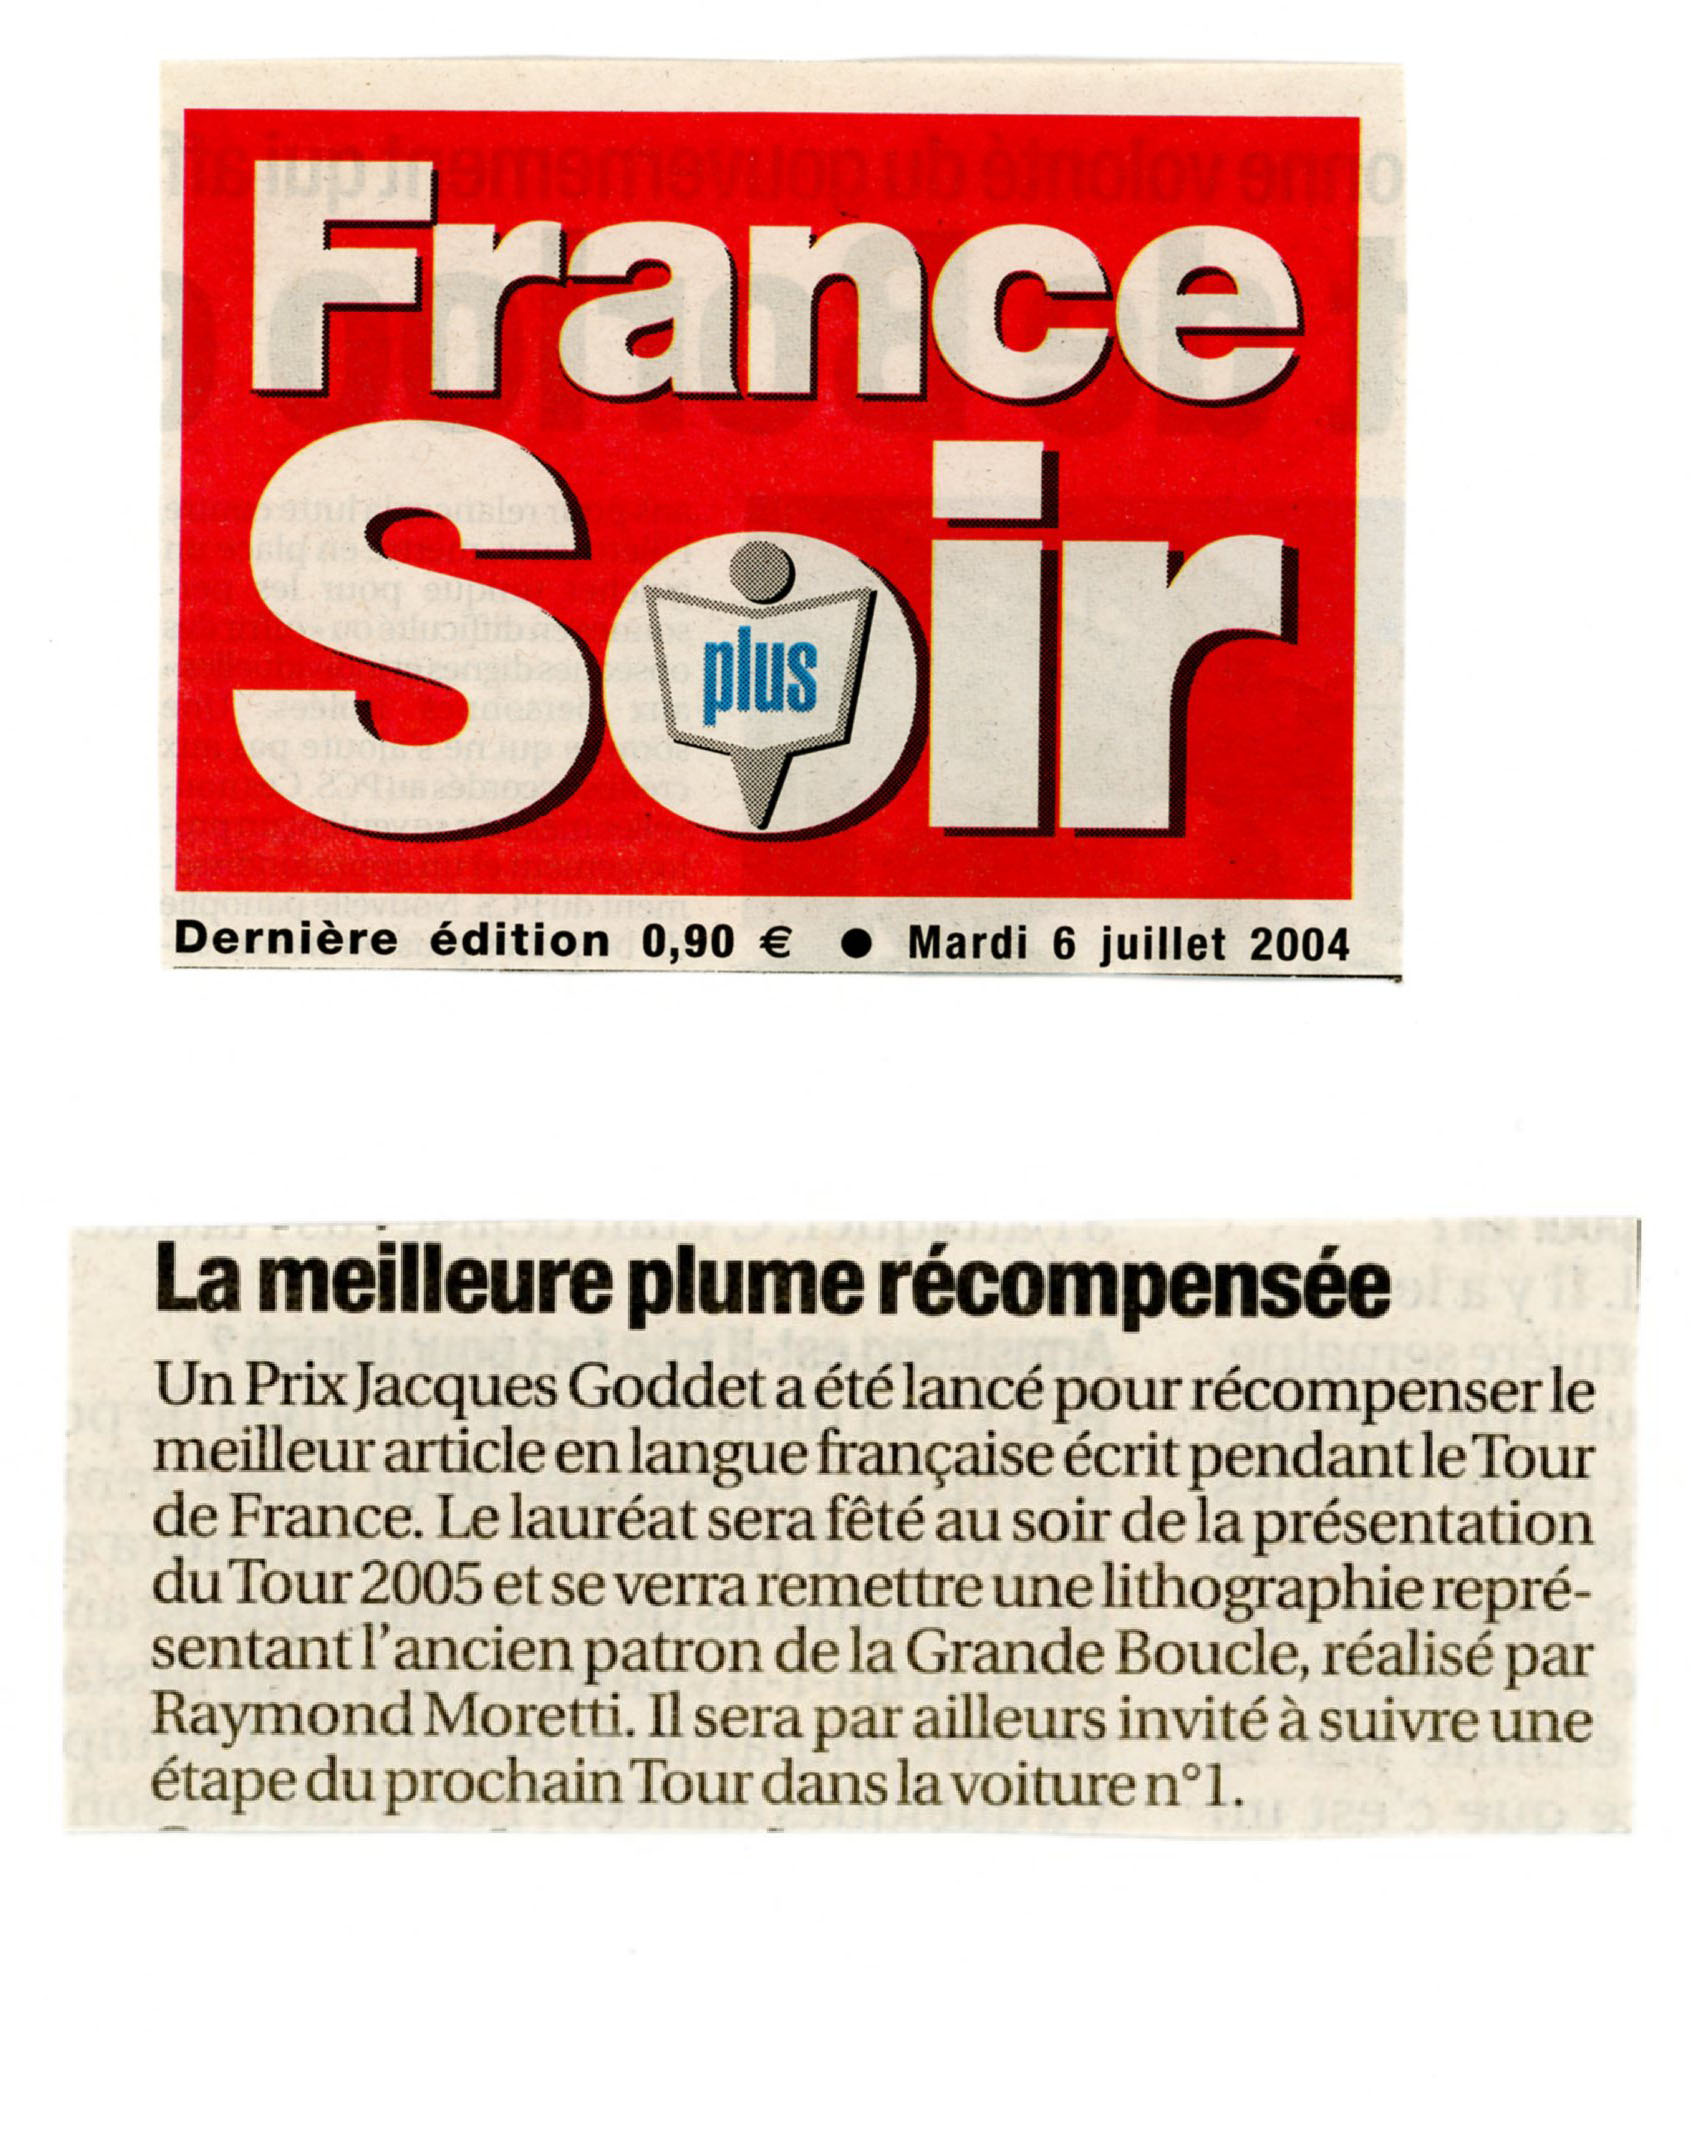 France Soir - Prix Jacques-Goddet - mardi 6 juillet 2004